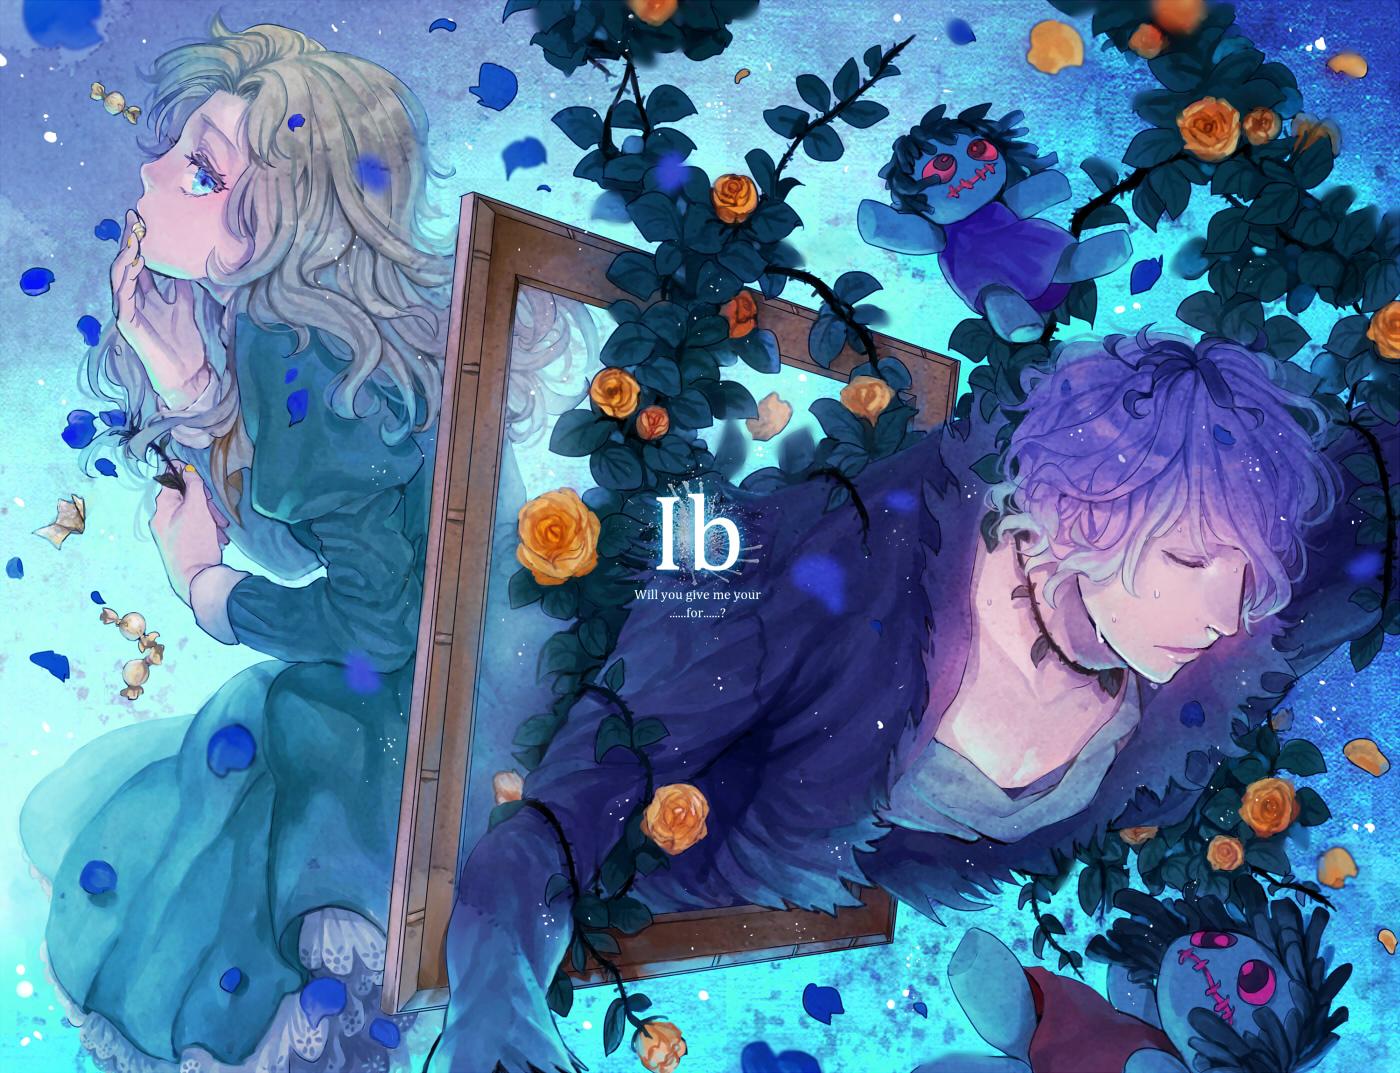 ib game wallpaper - photo #16